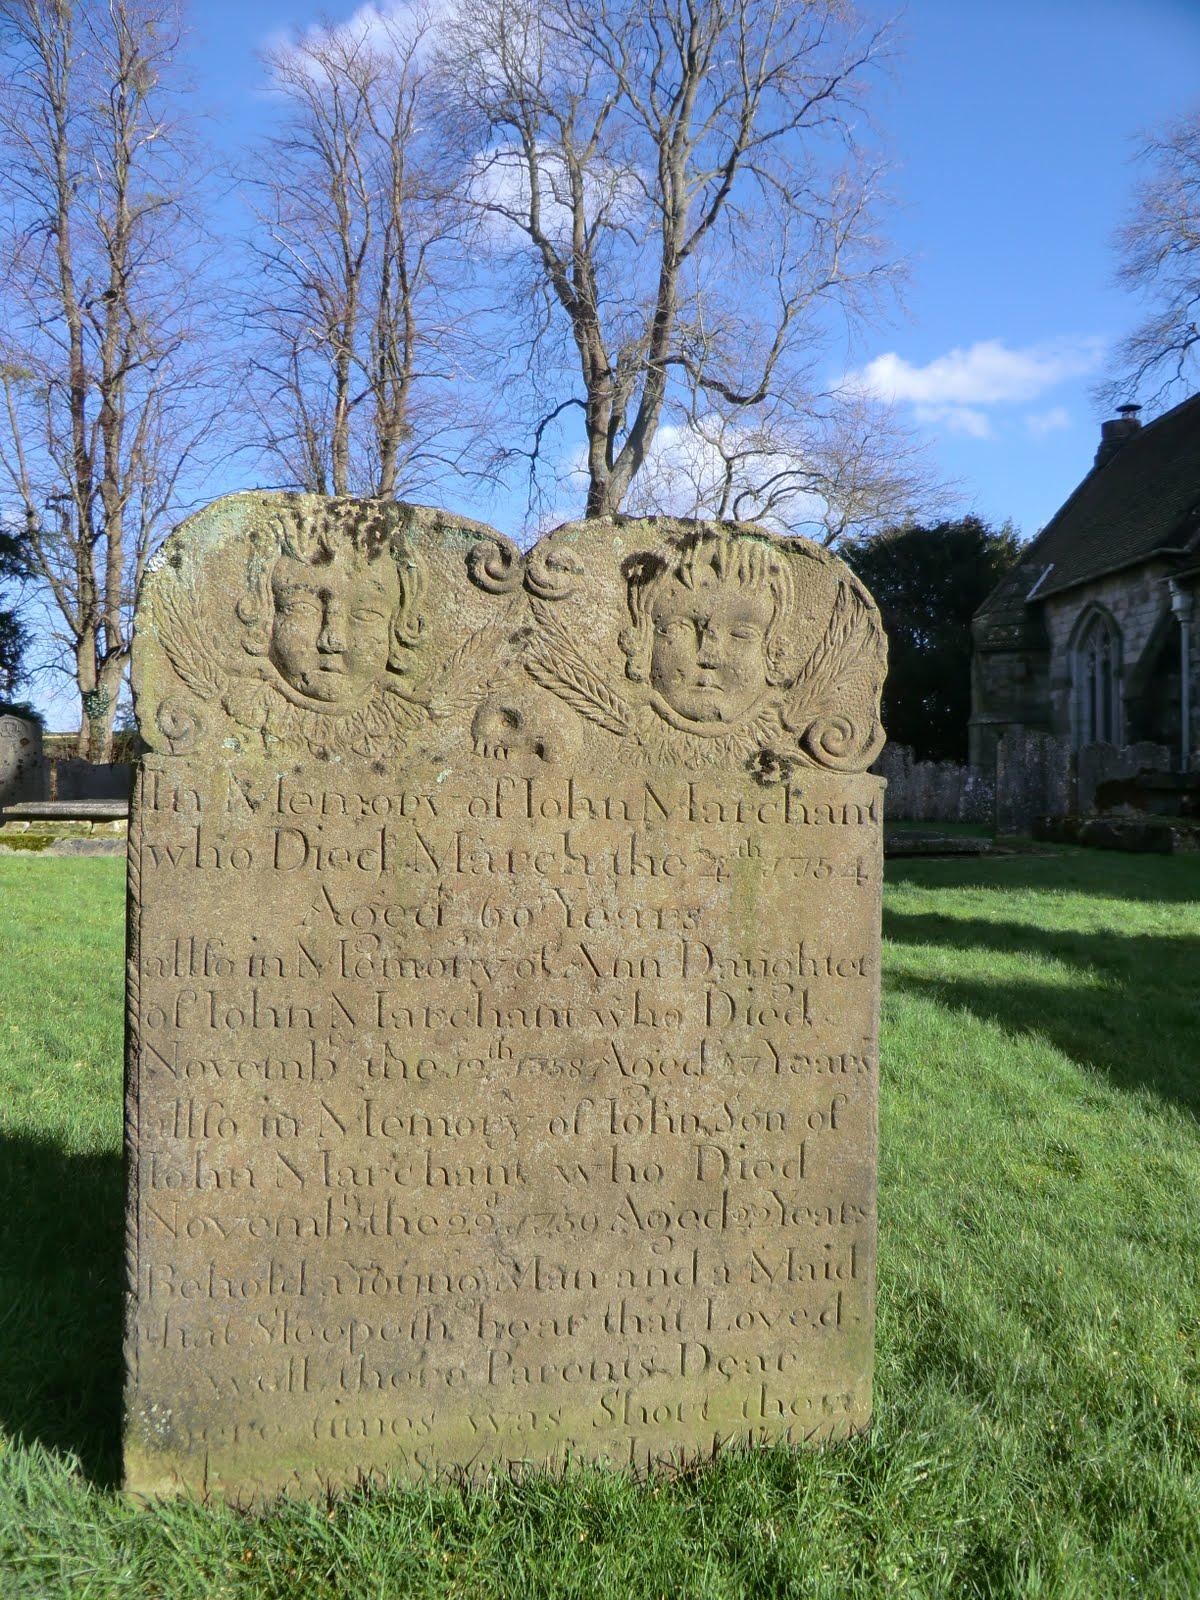 CIMG9931 Gravestone, Penshurst churchyard